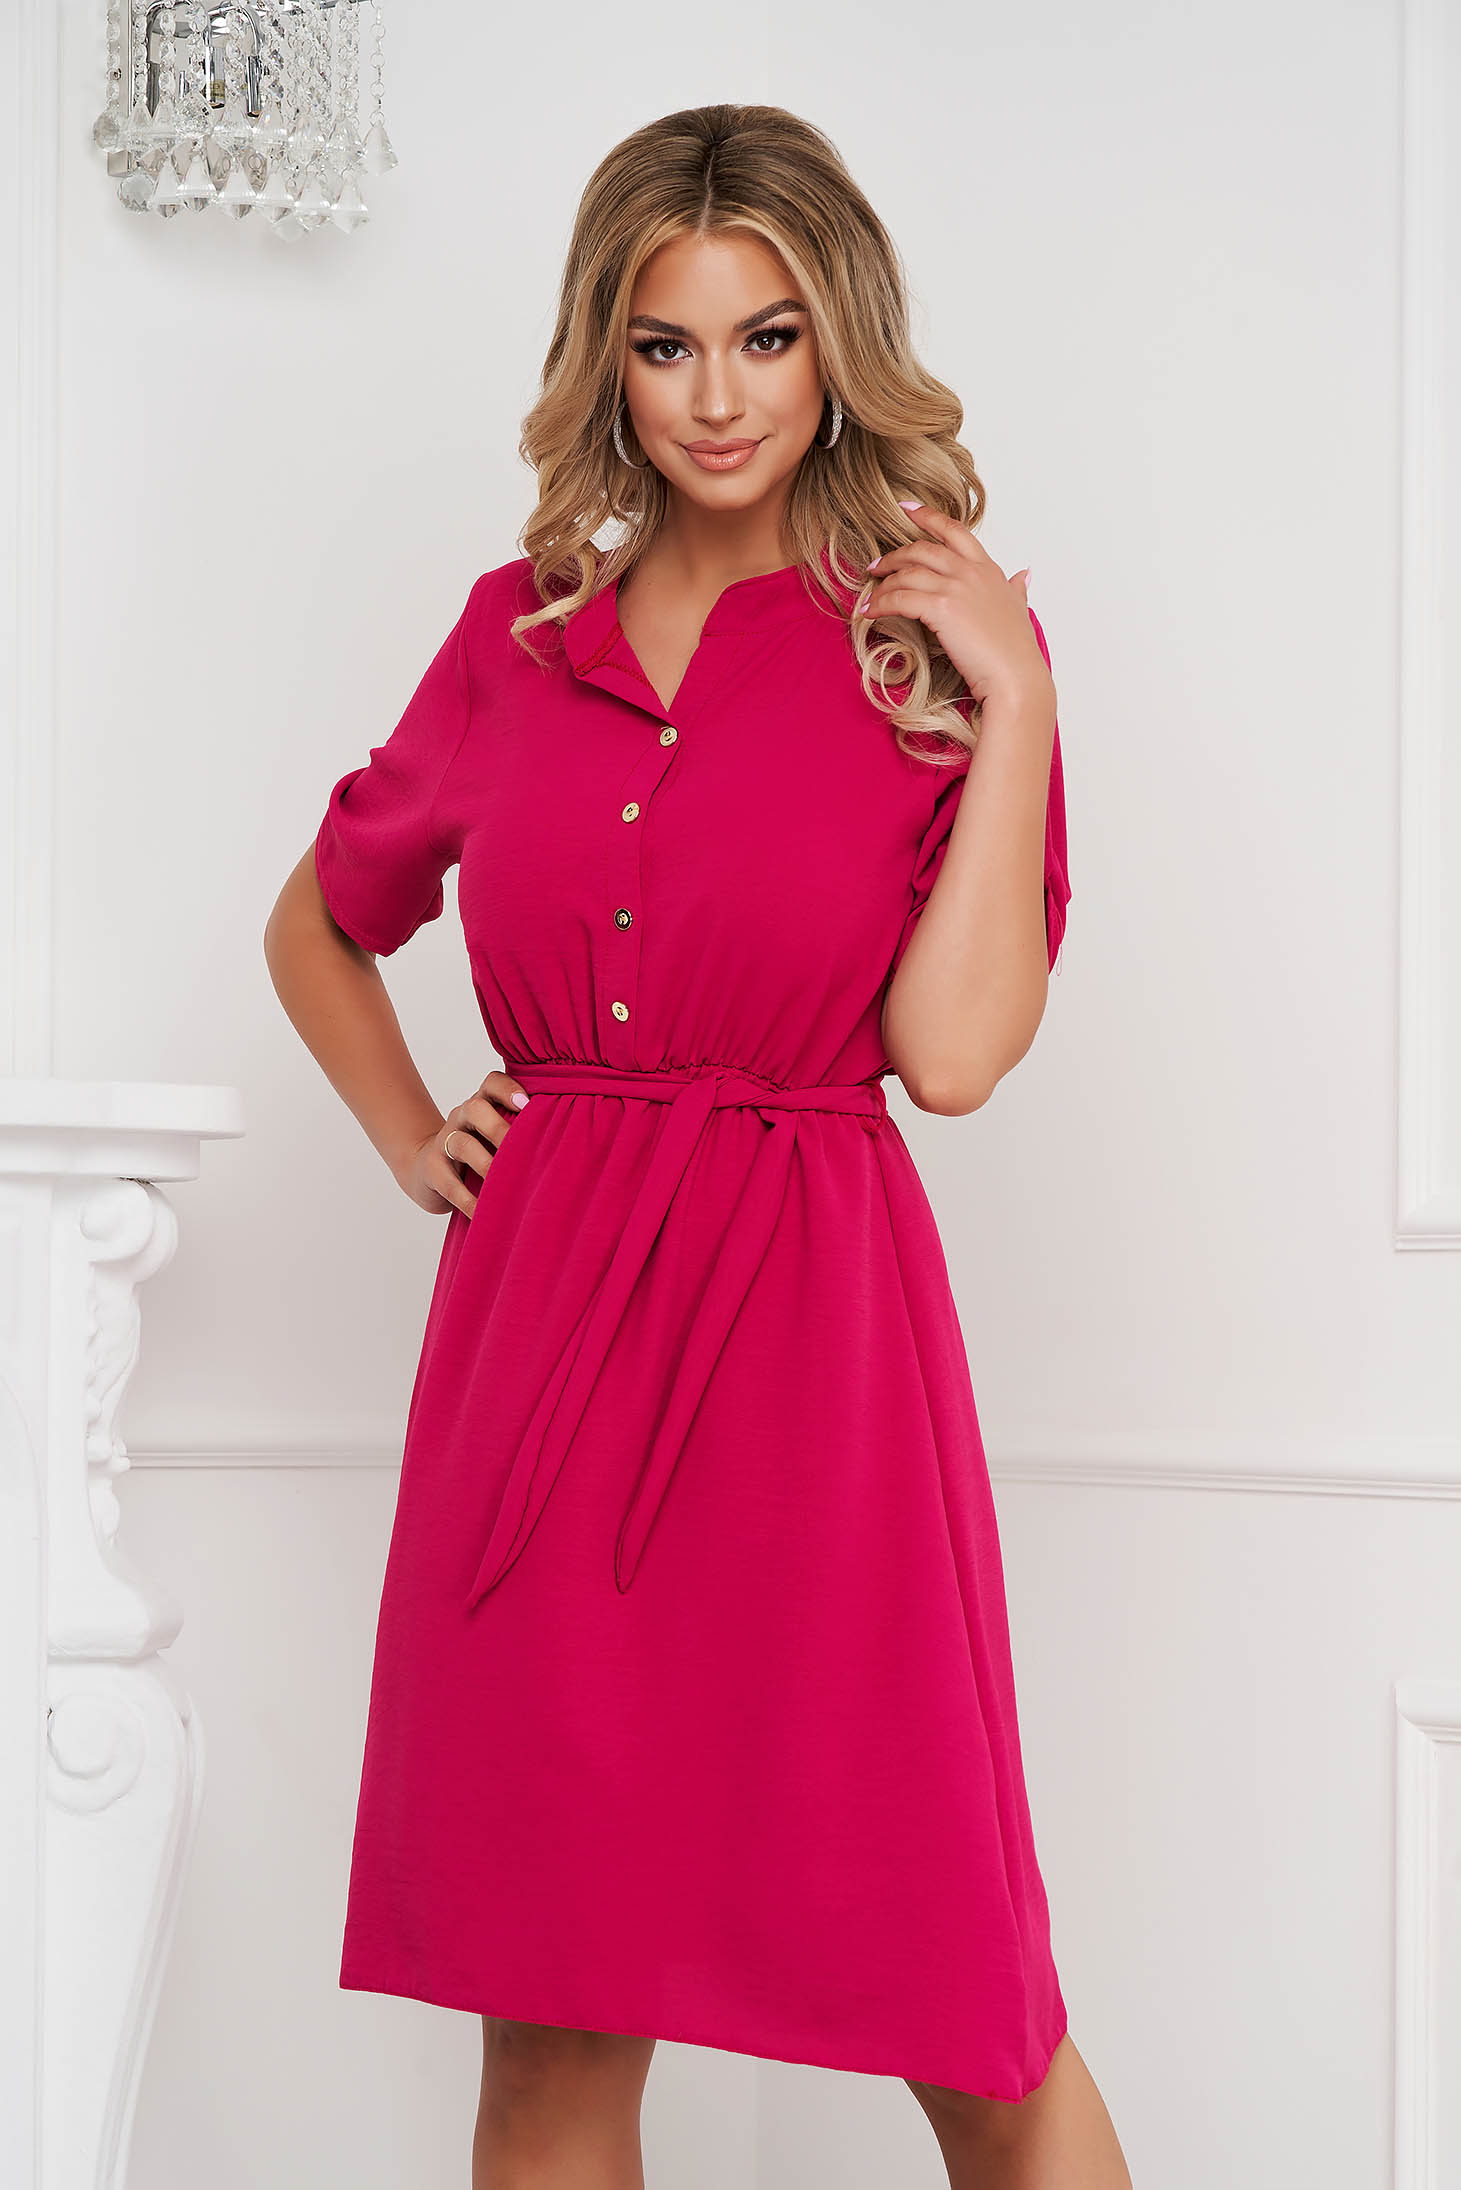 Raspberry dress midi cloche with elastic waist wrinkled material short sleeves